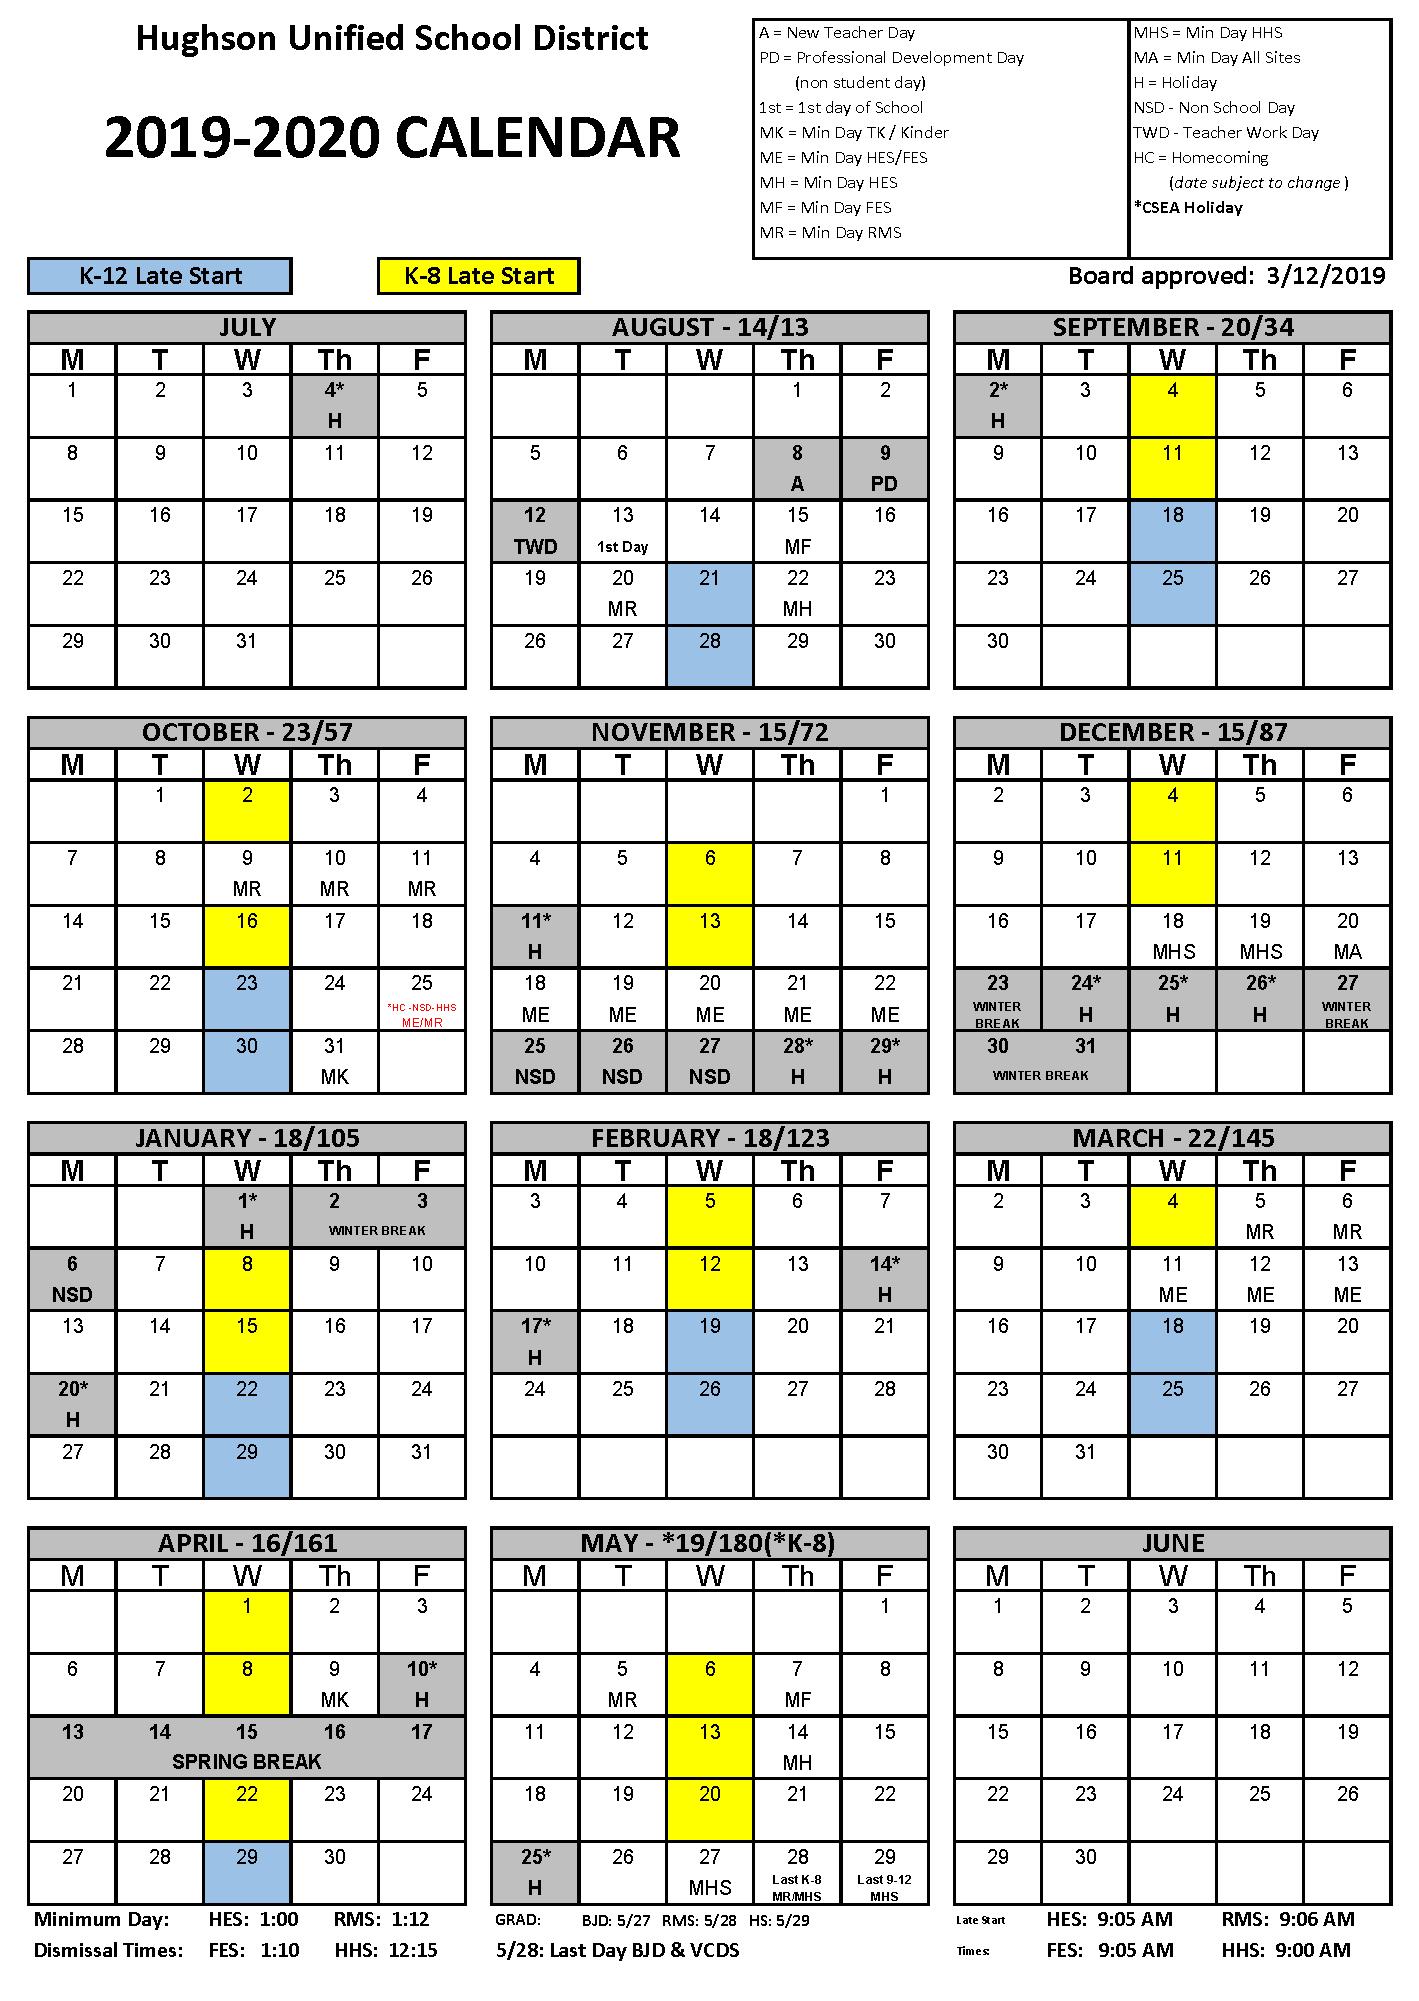 Calendar - Hughson Unified School District in Merced County Middle Schools Calendar